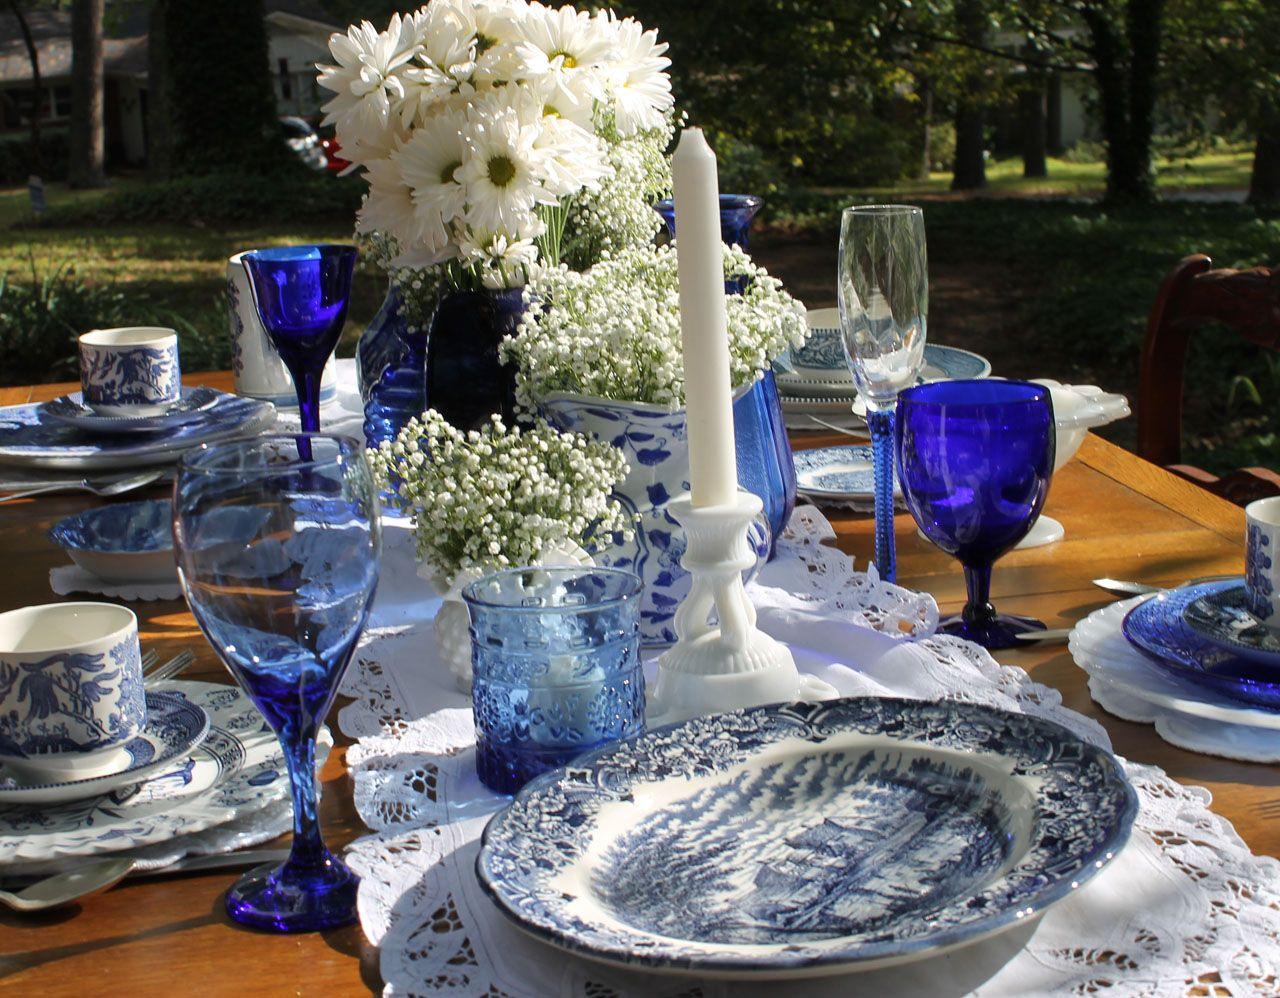 Cobalt blue glass a beautiful inspiration for wedding ...